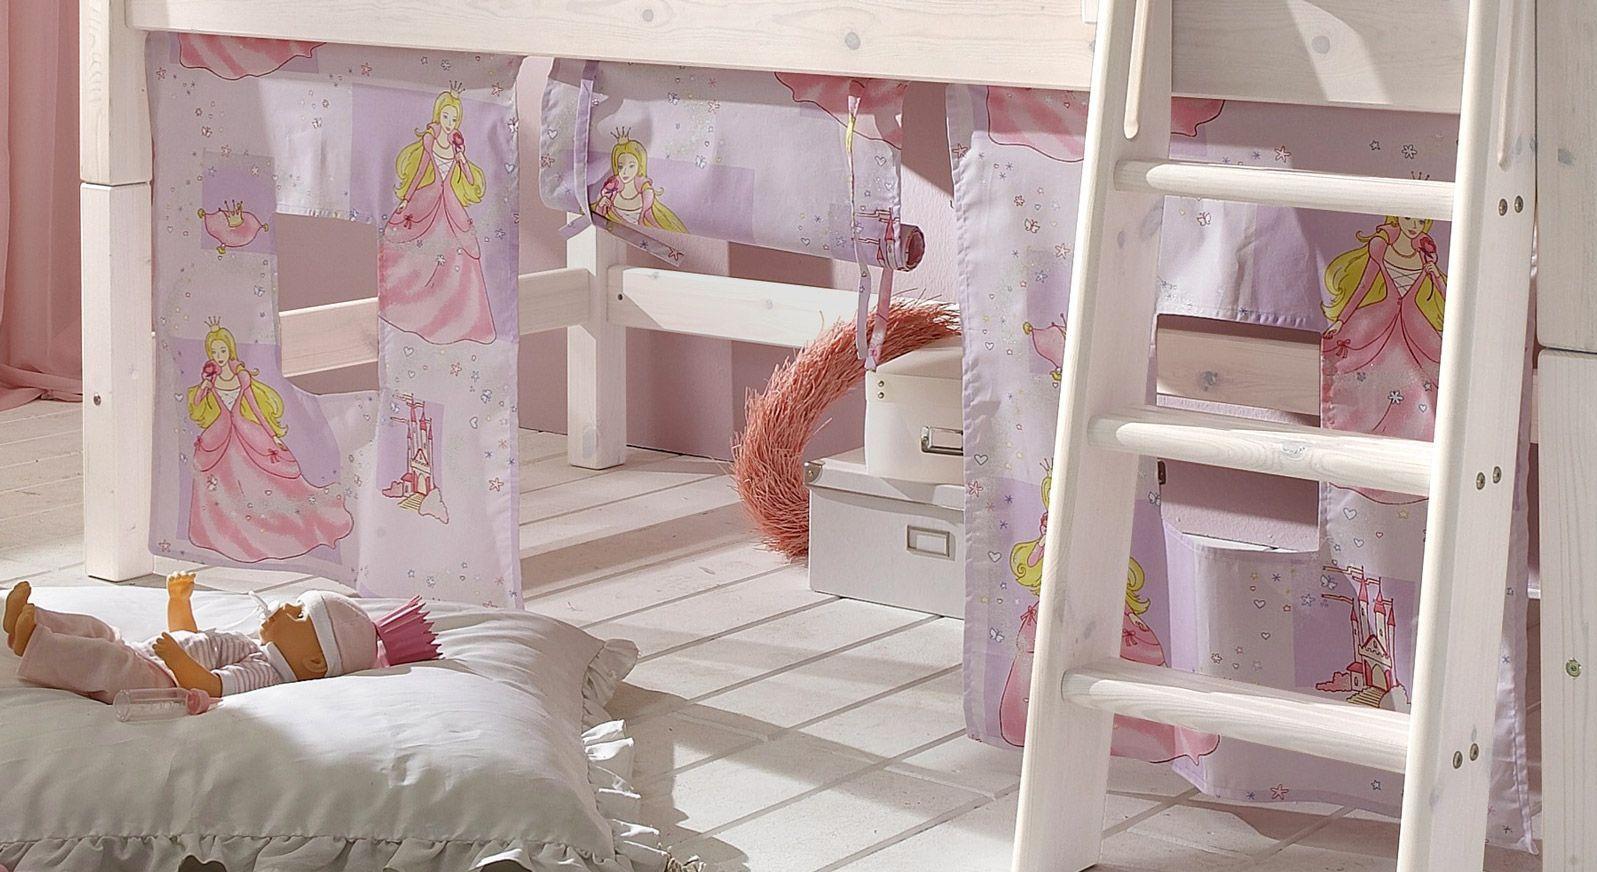 Prinzessinnen Etagenbett : Kinder hochbett prinzessin günstig kaufen betten.de